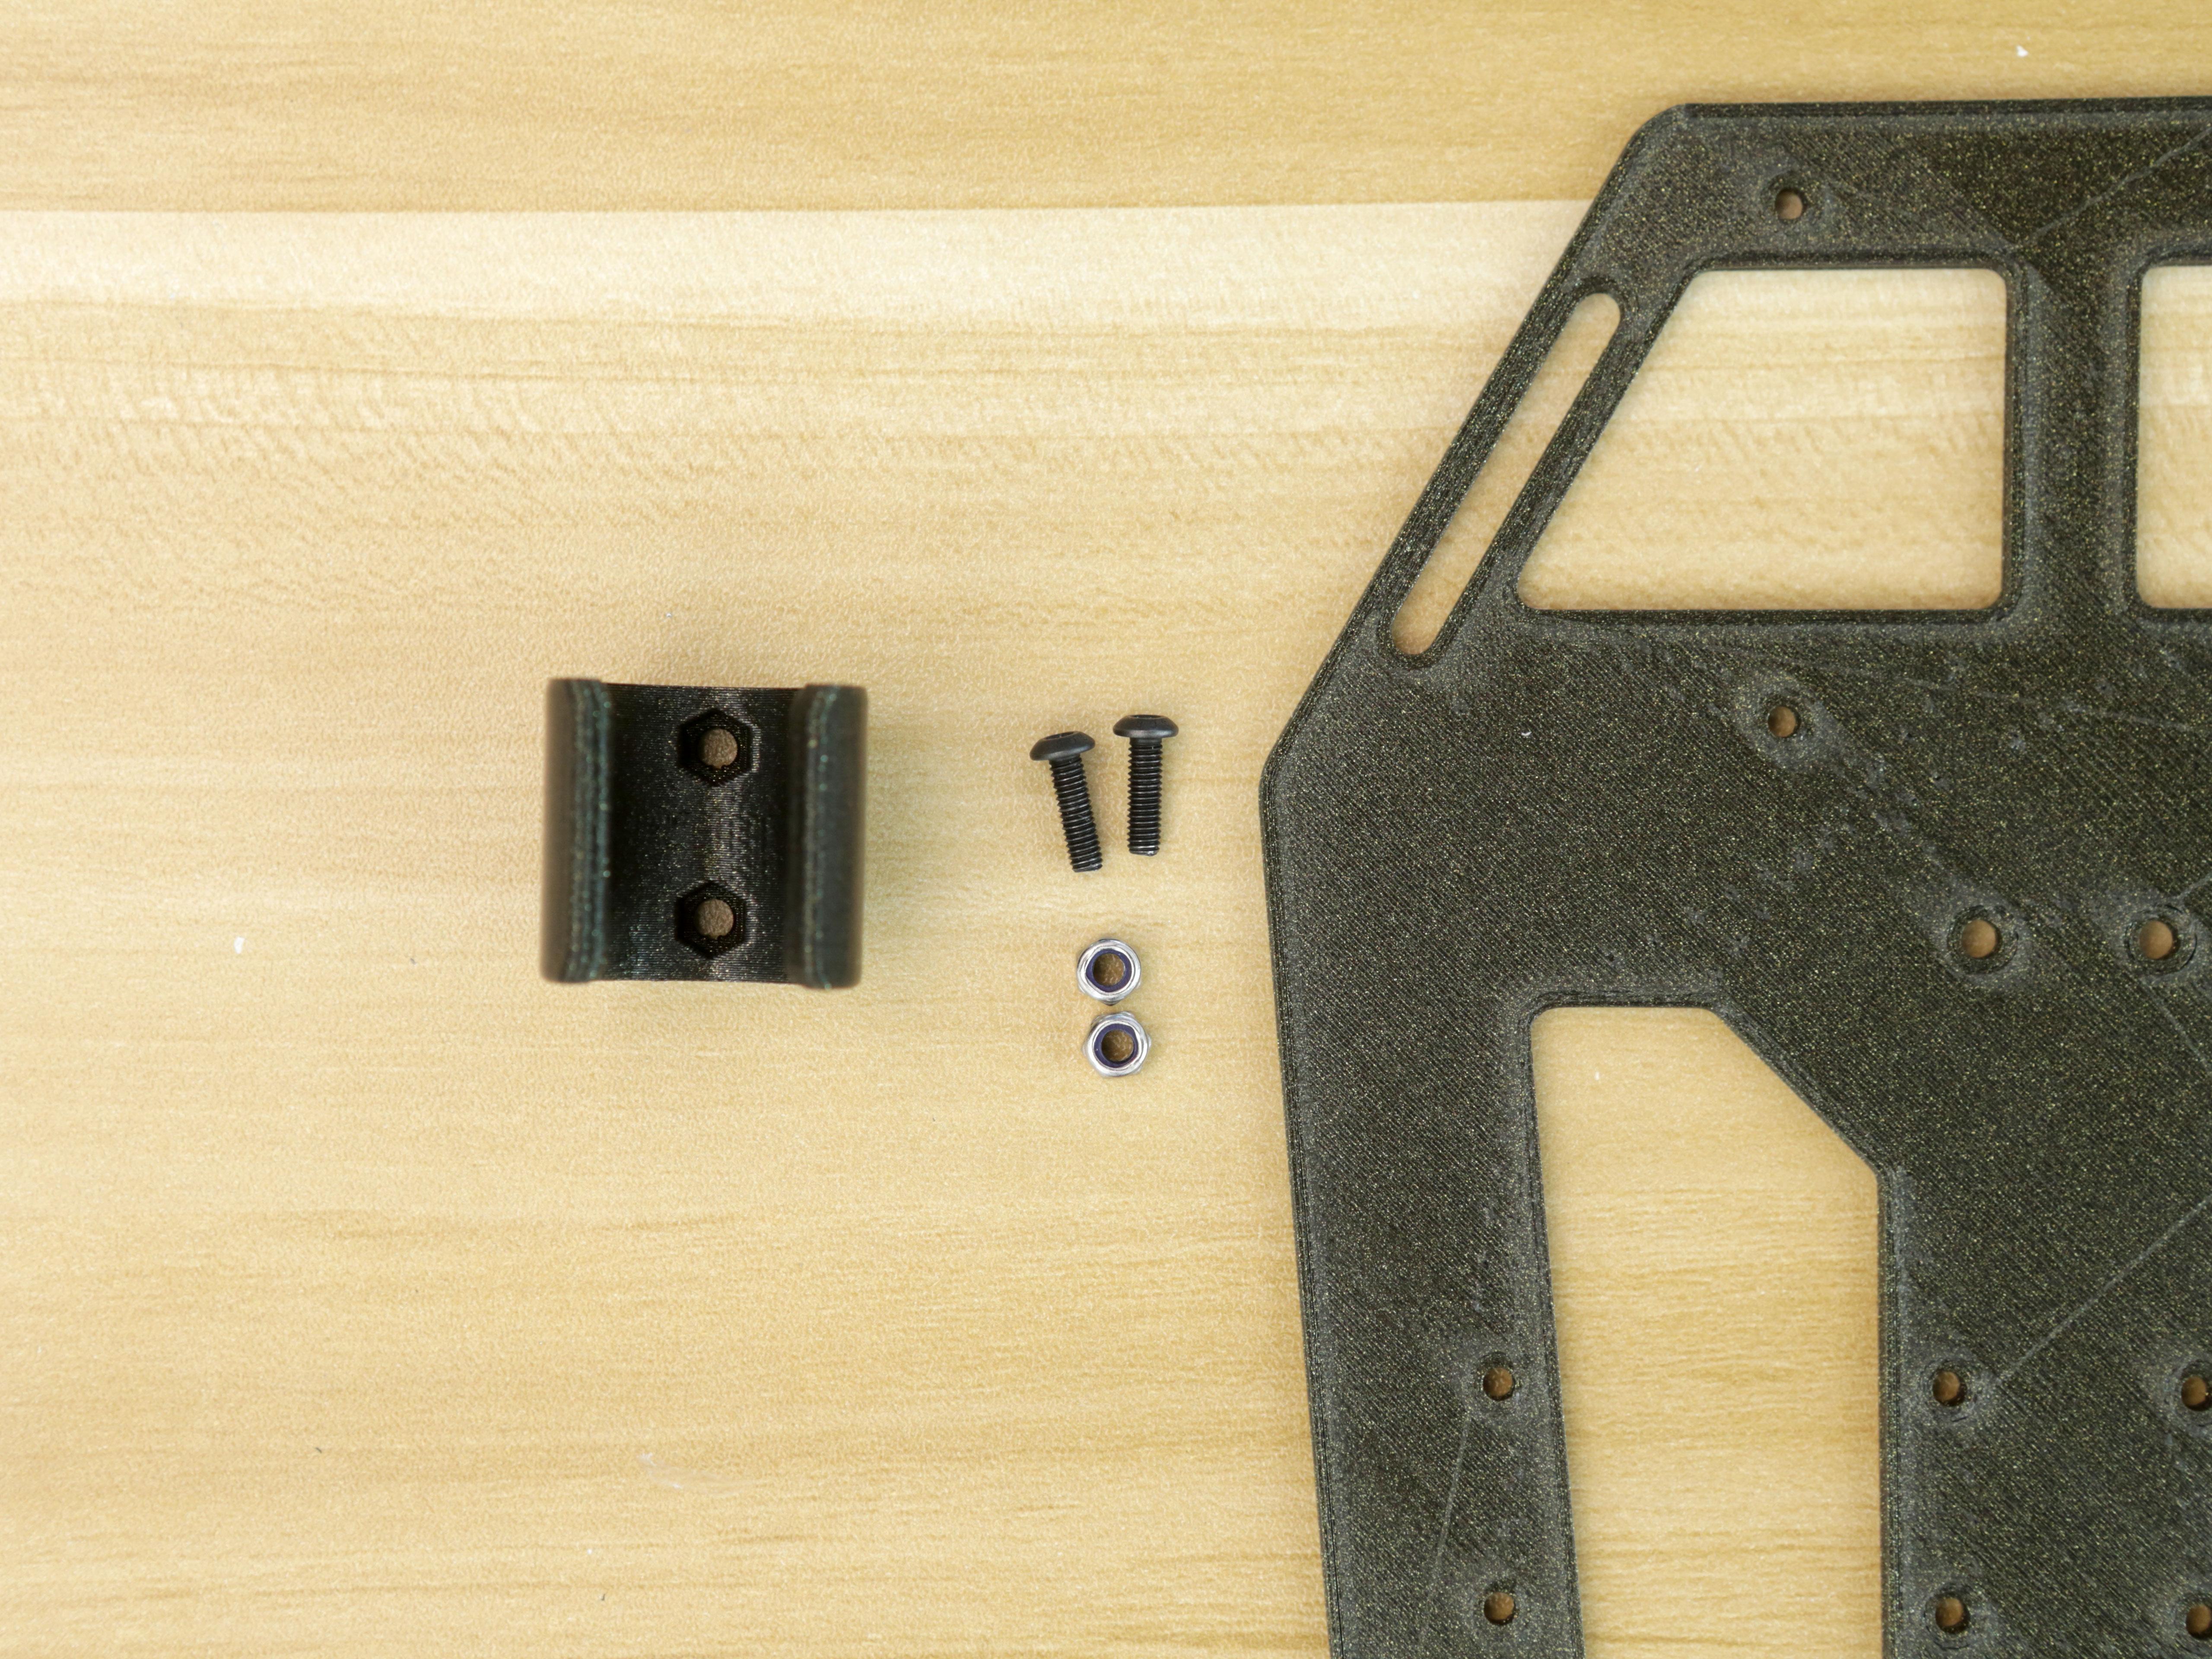 3d_printing_battery-clip-screws.jpg